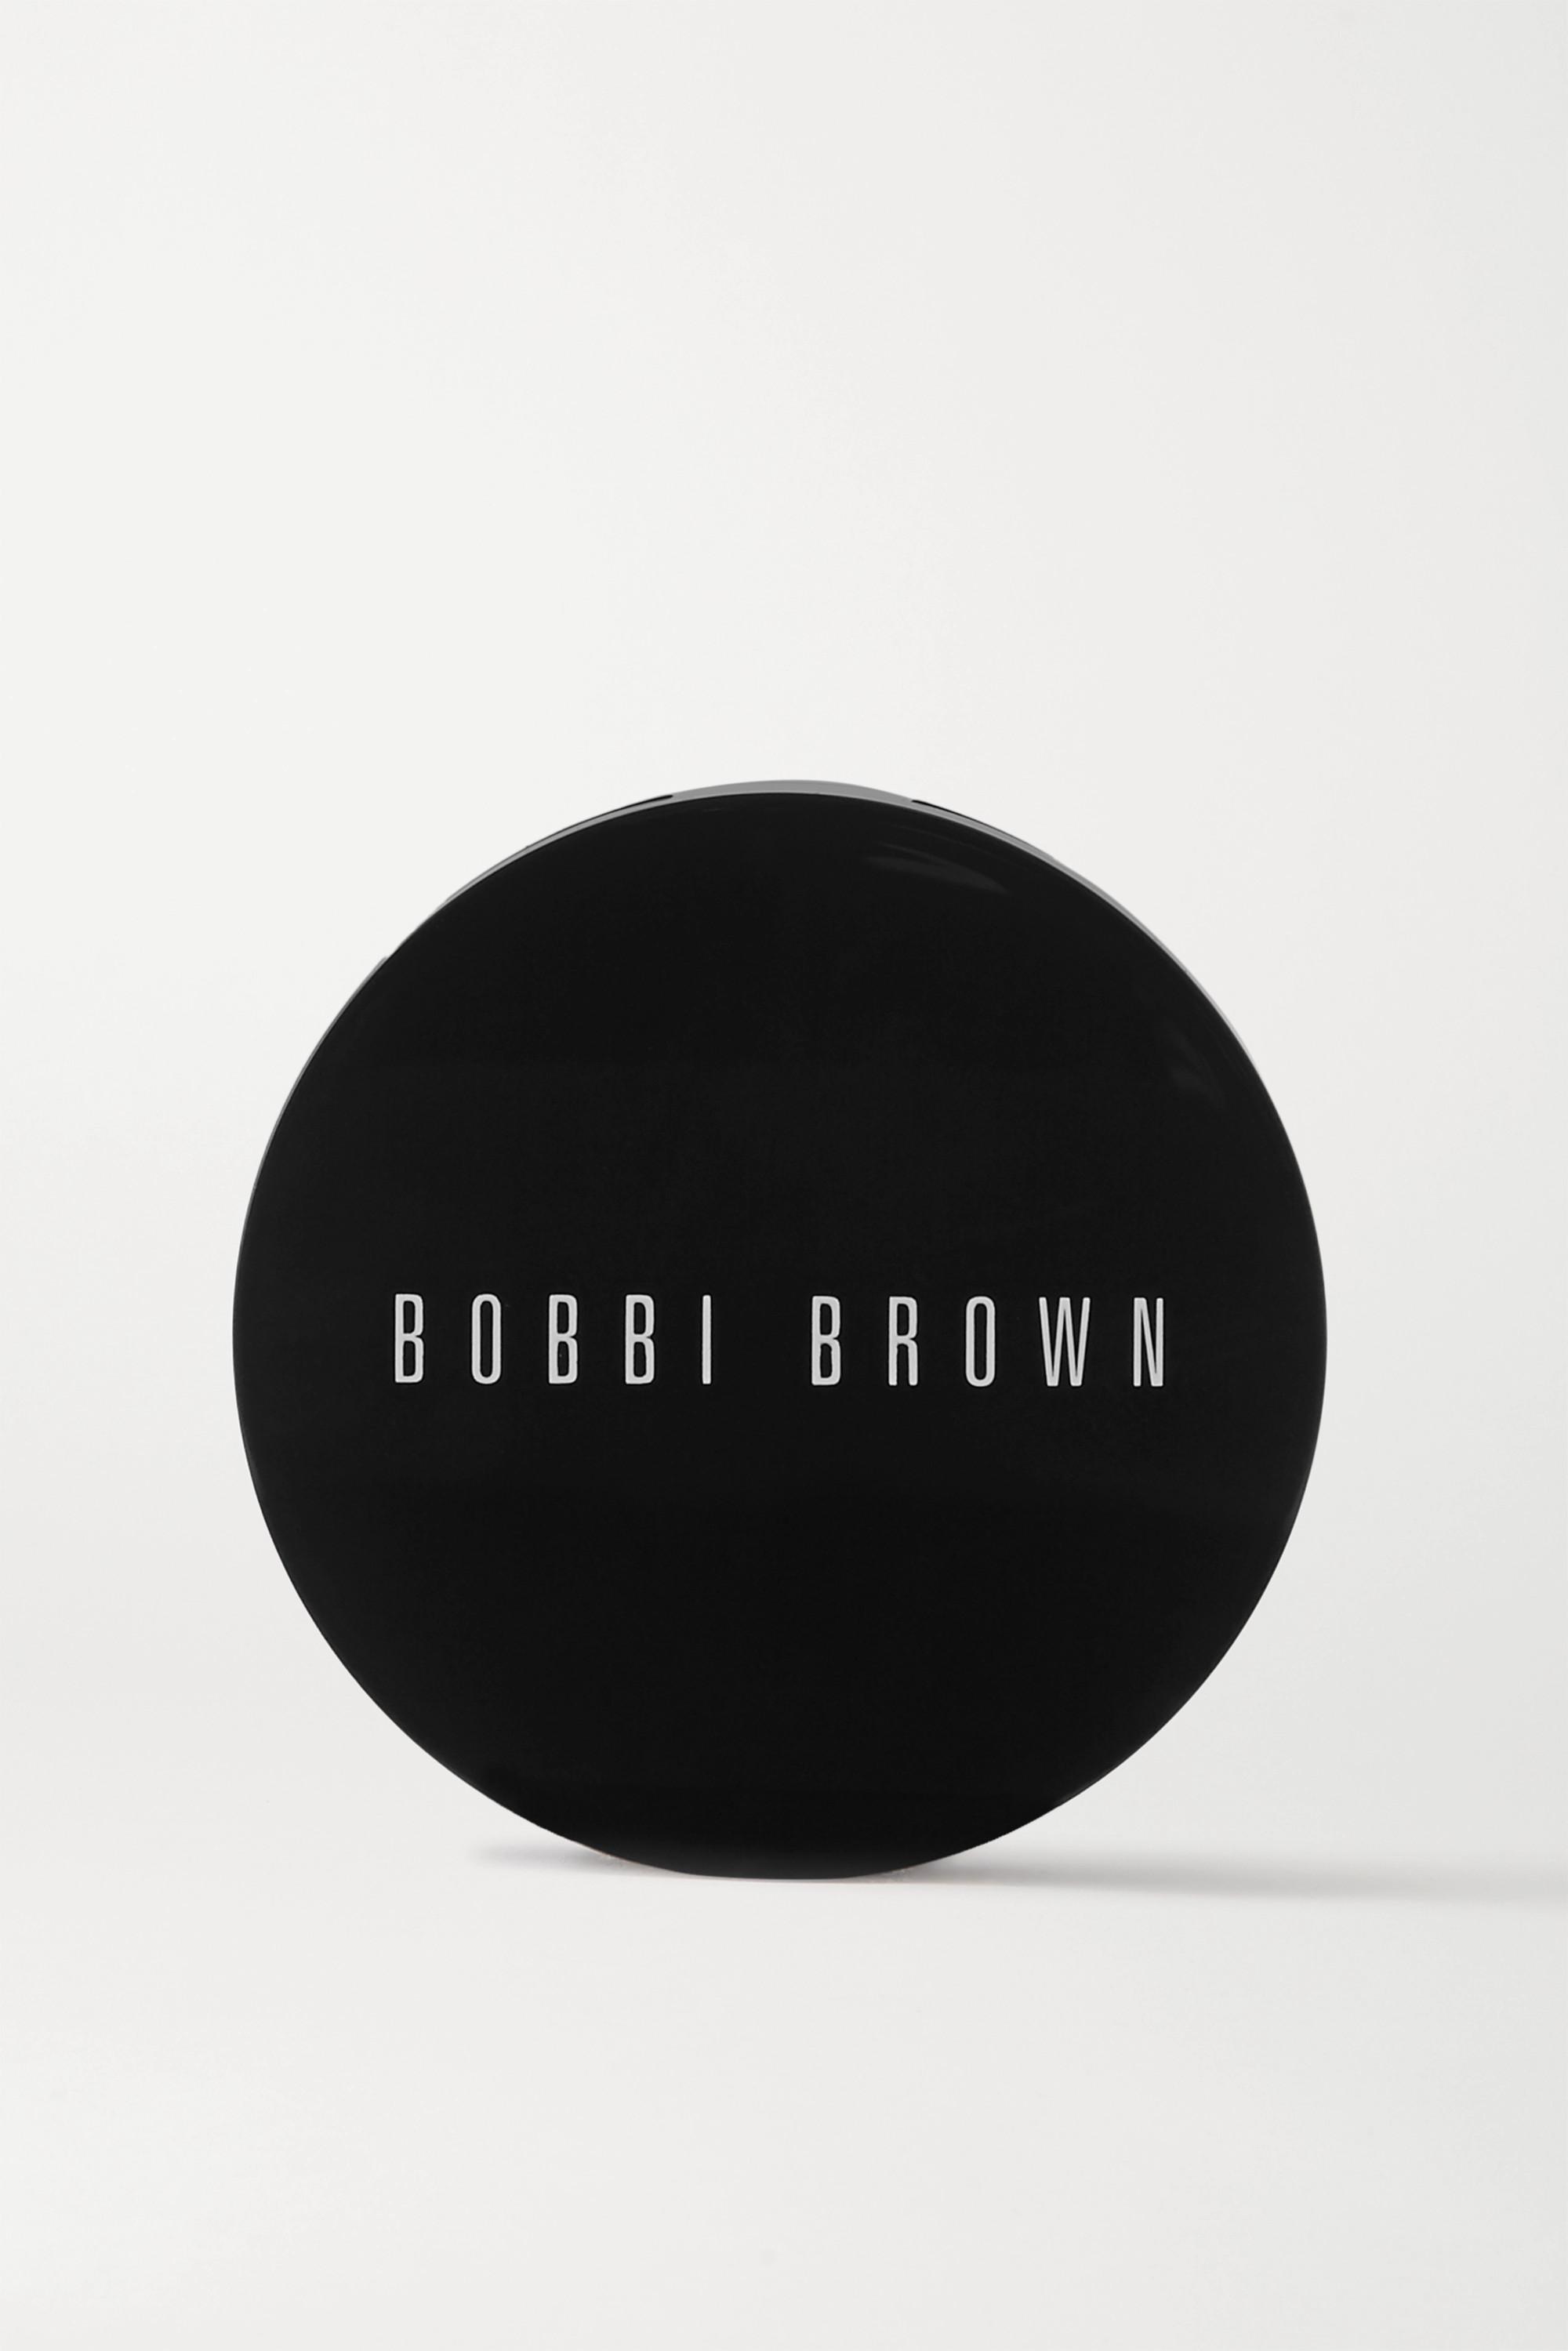 Bobbi Brown Bronzing Powder - Golden Light 1